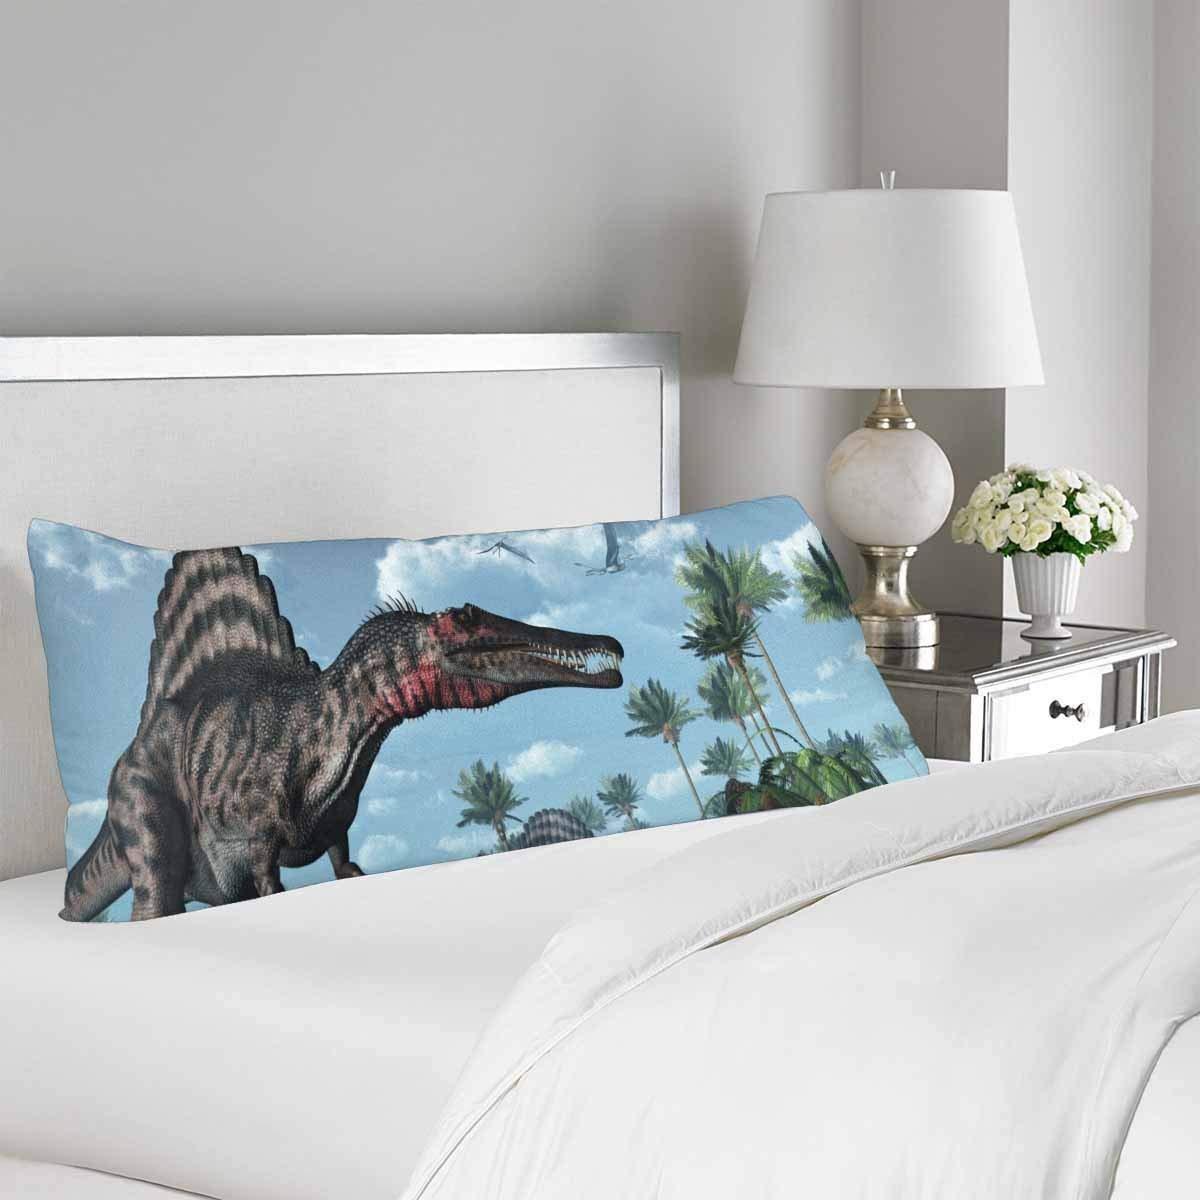 gckg tropical prehistoric scene dinosaur body pillow covers pillowcase 20x60 inches palm tree body pillow case protector